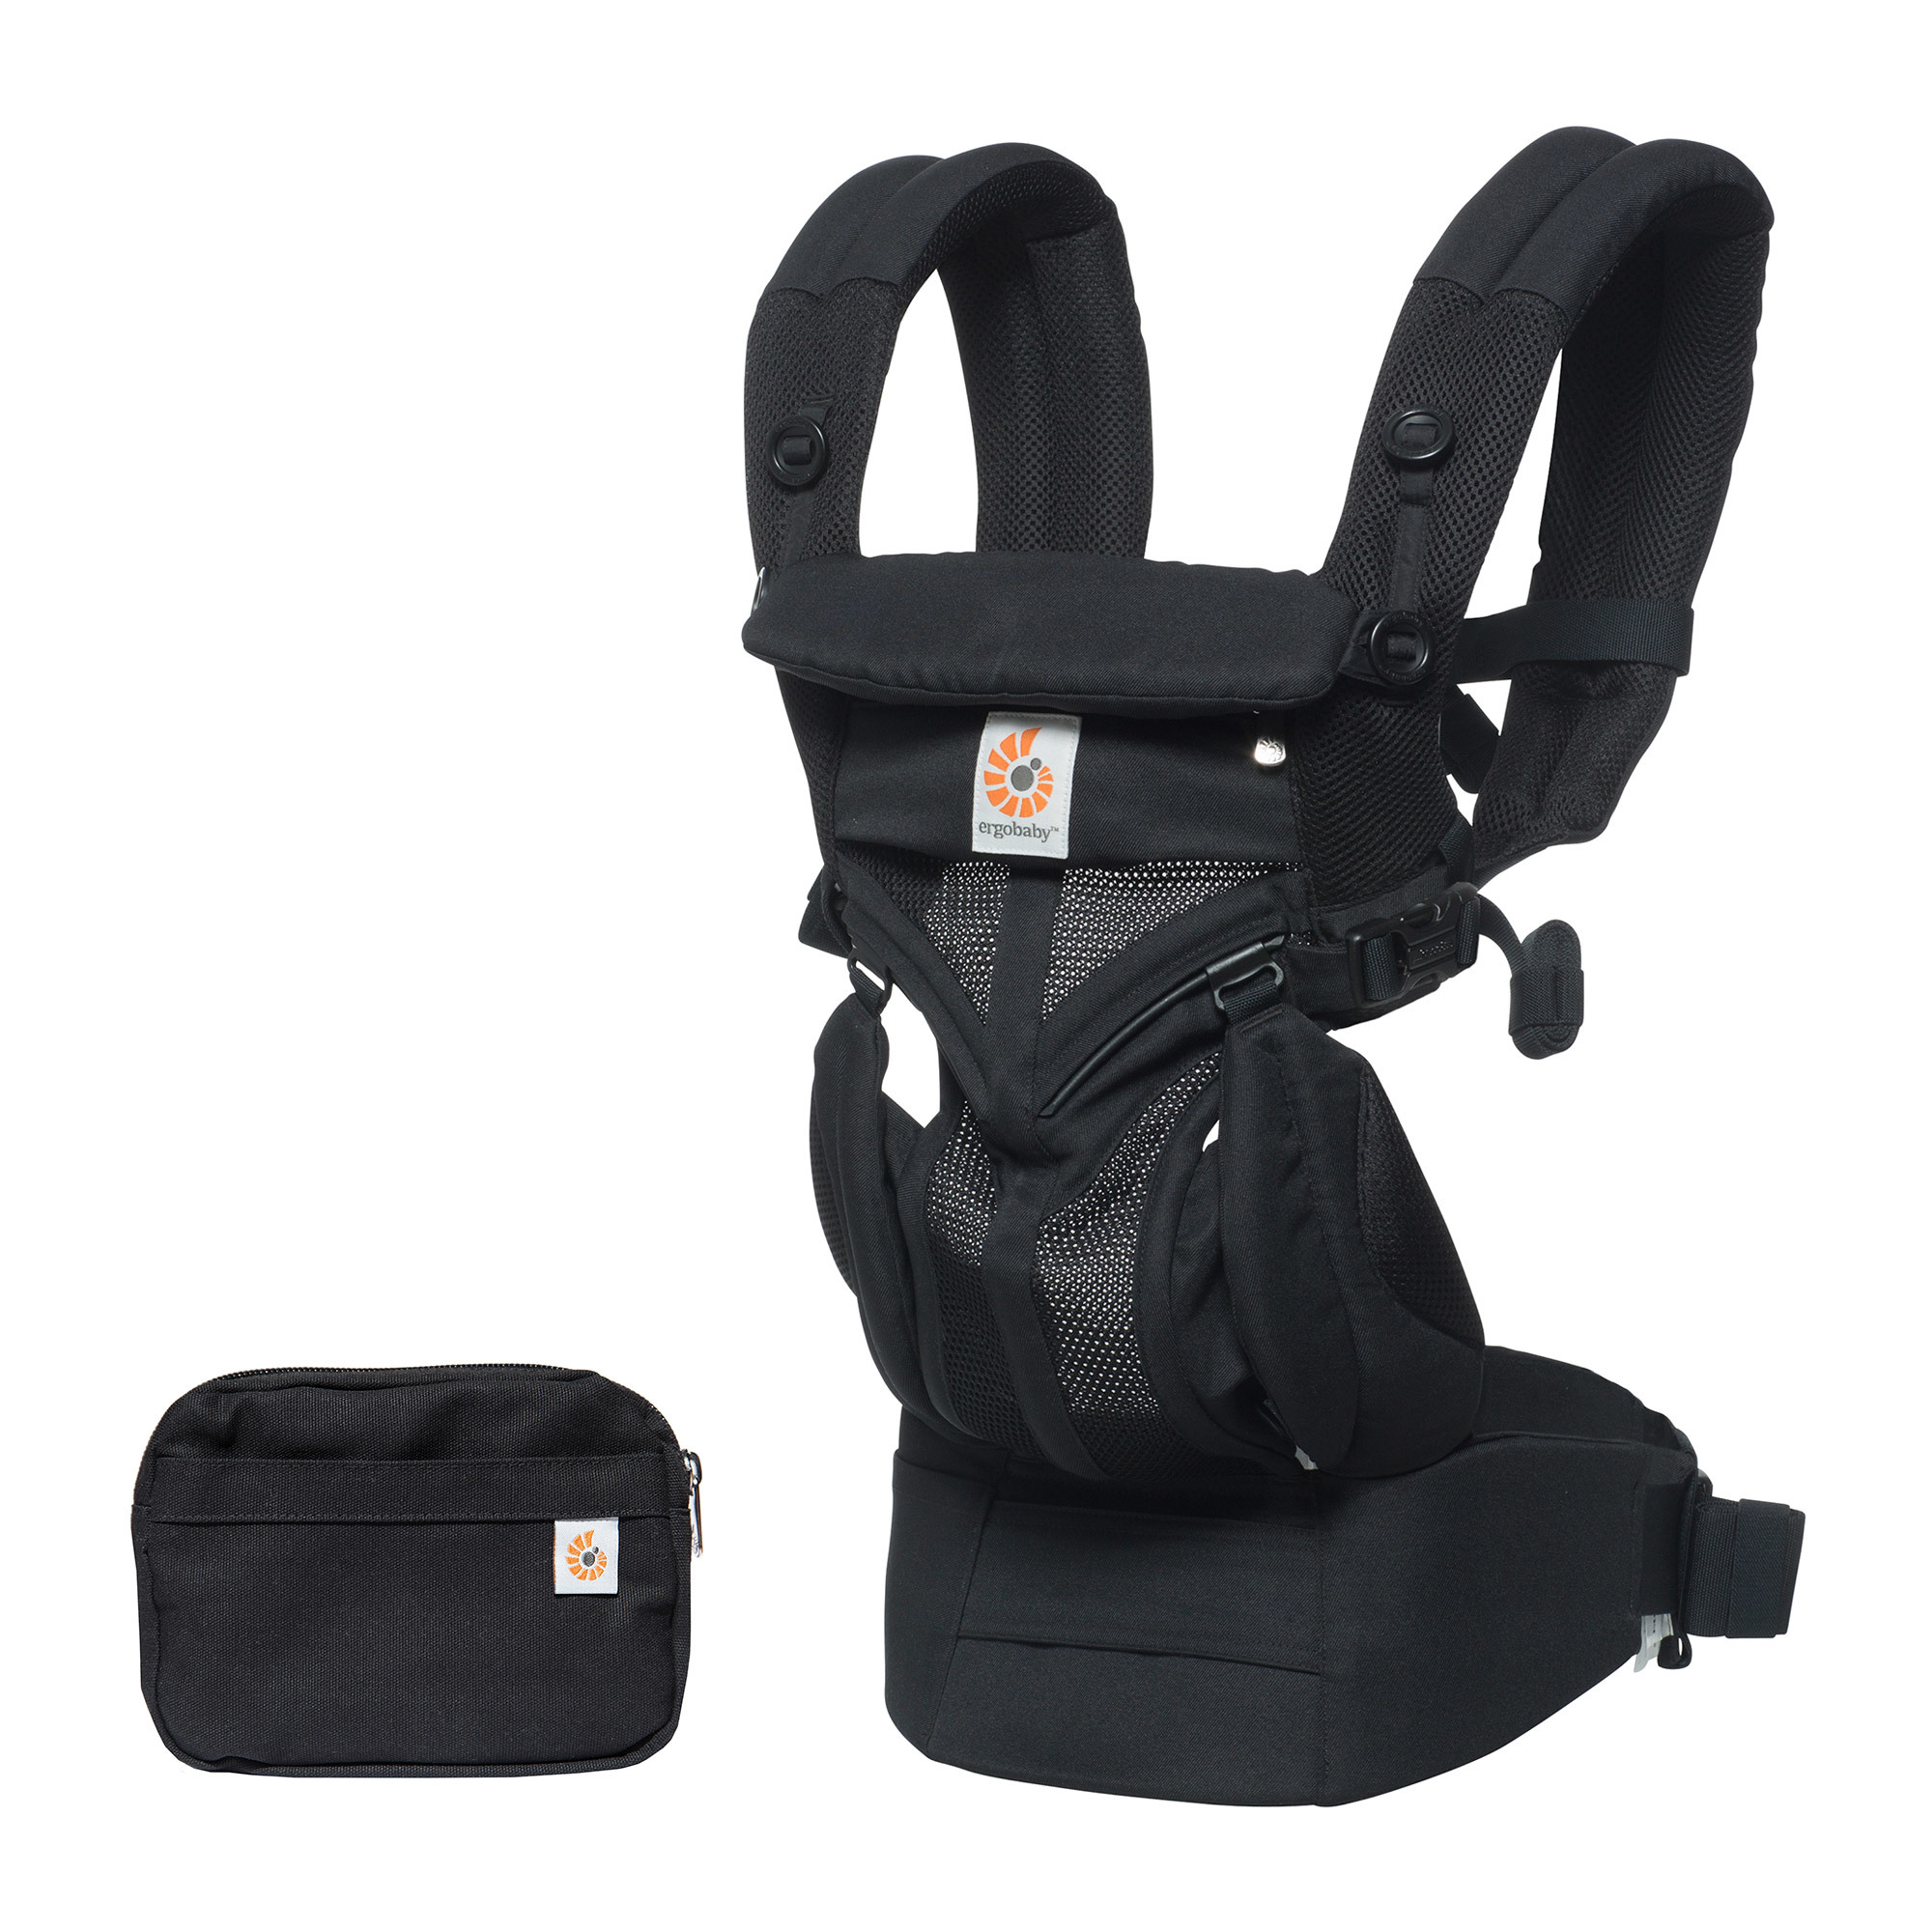 Рюкзак-Кенгуру Omni 360 Cool Air Mesh (4 Position)